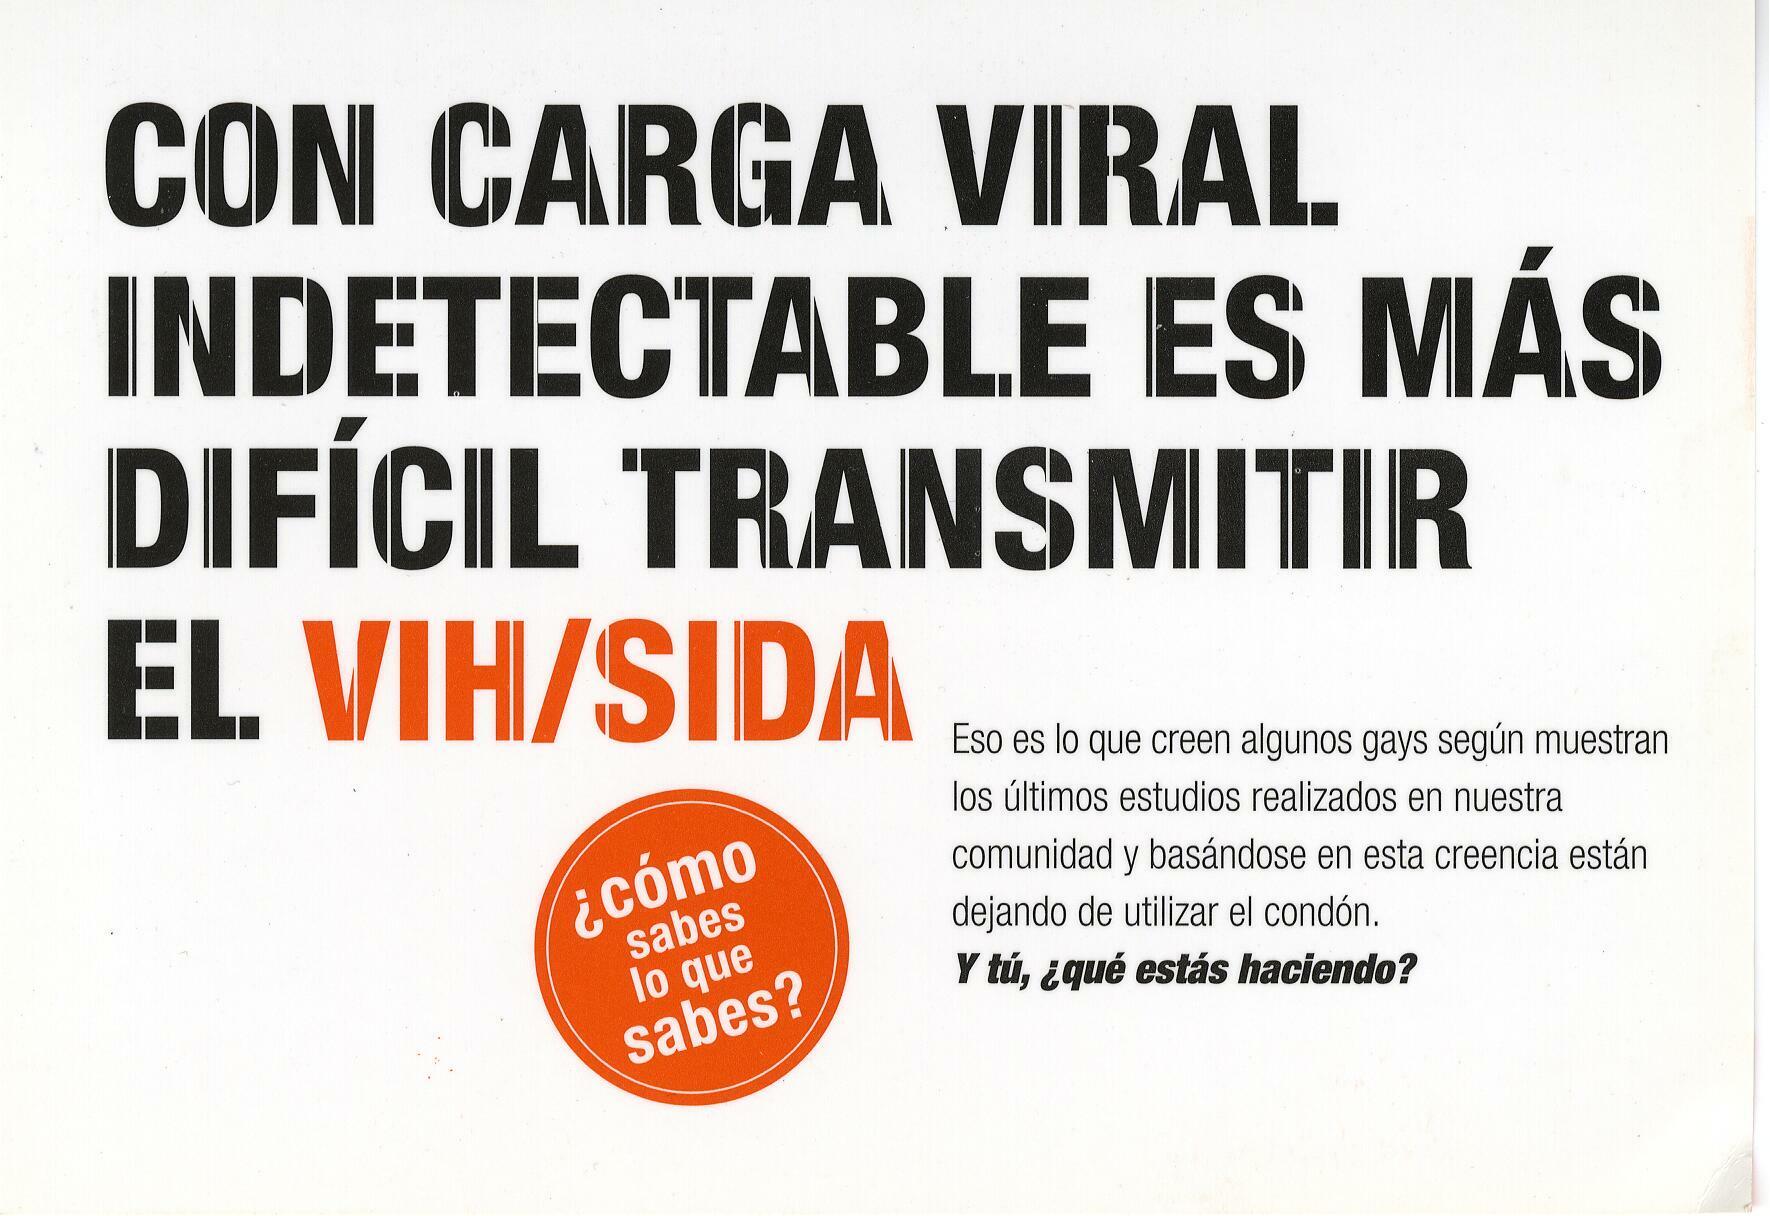 Metodos Para Detectar La Carga Viral Indetectable VIH